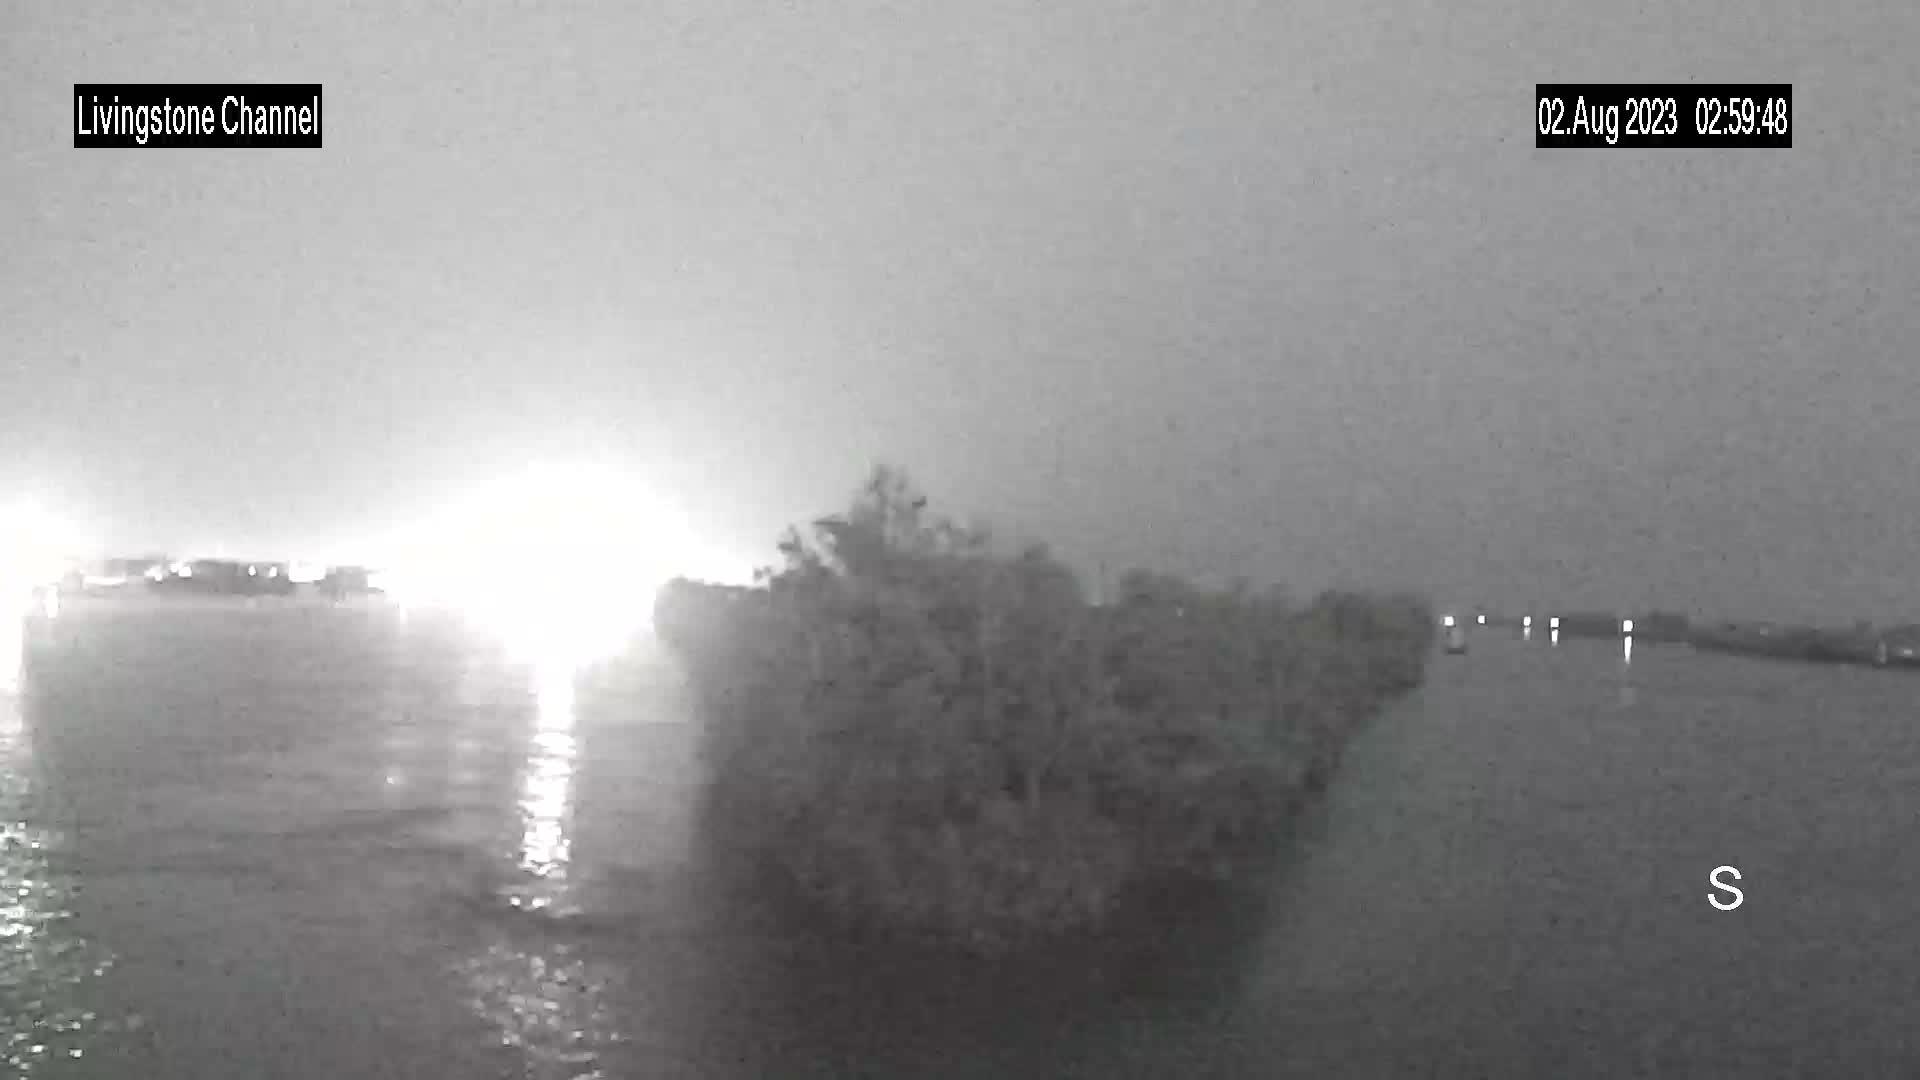 Livingstone Channel